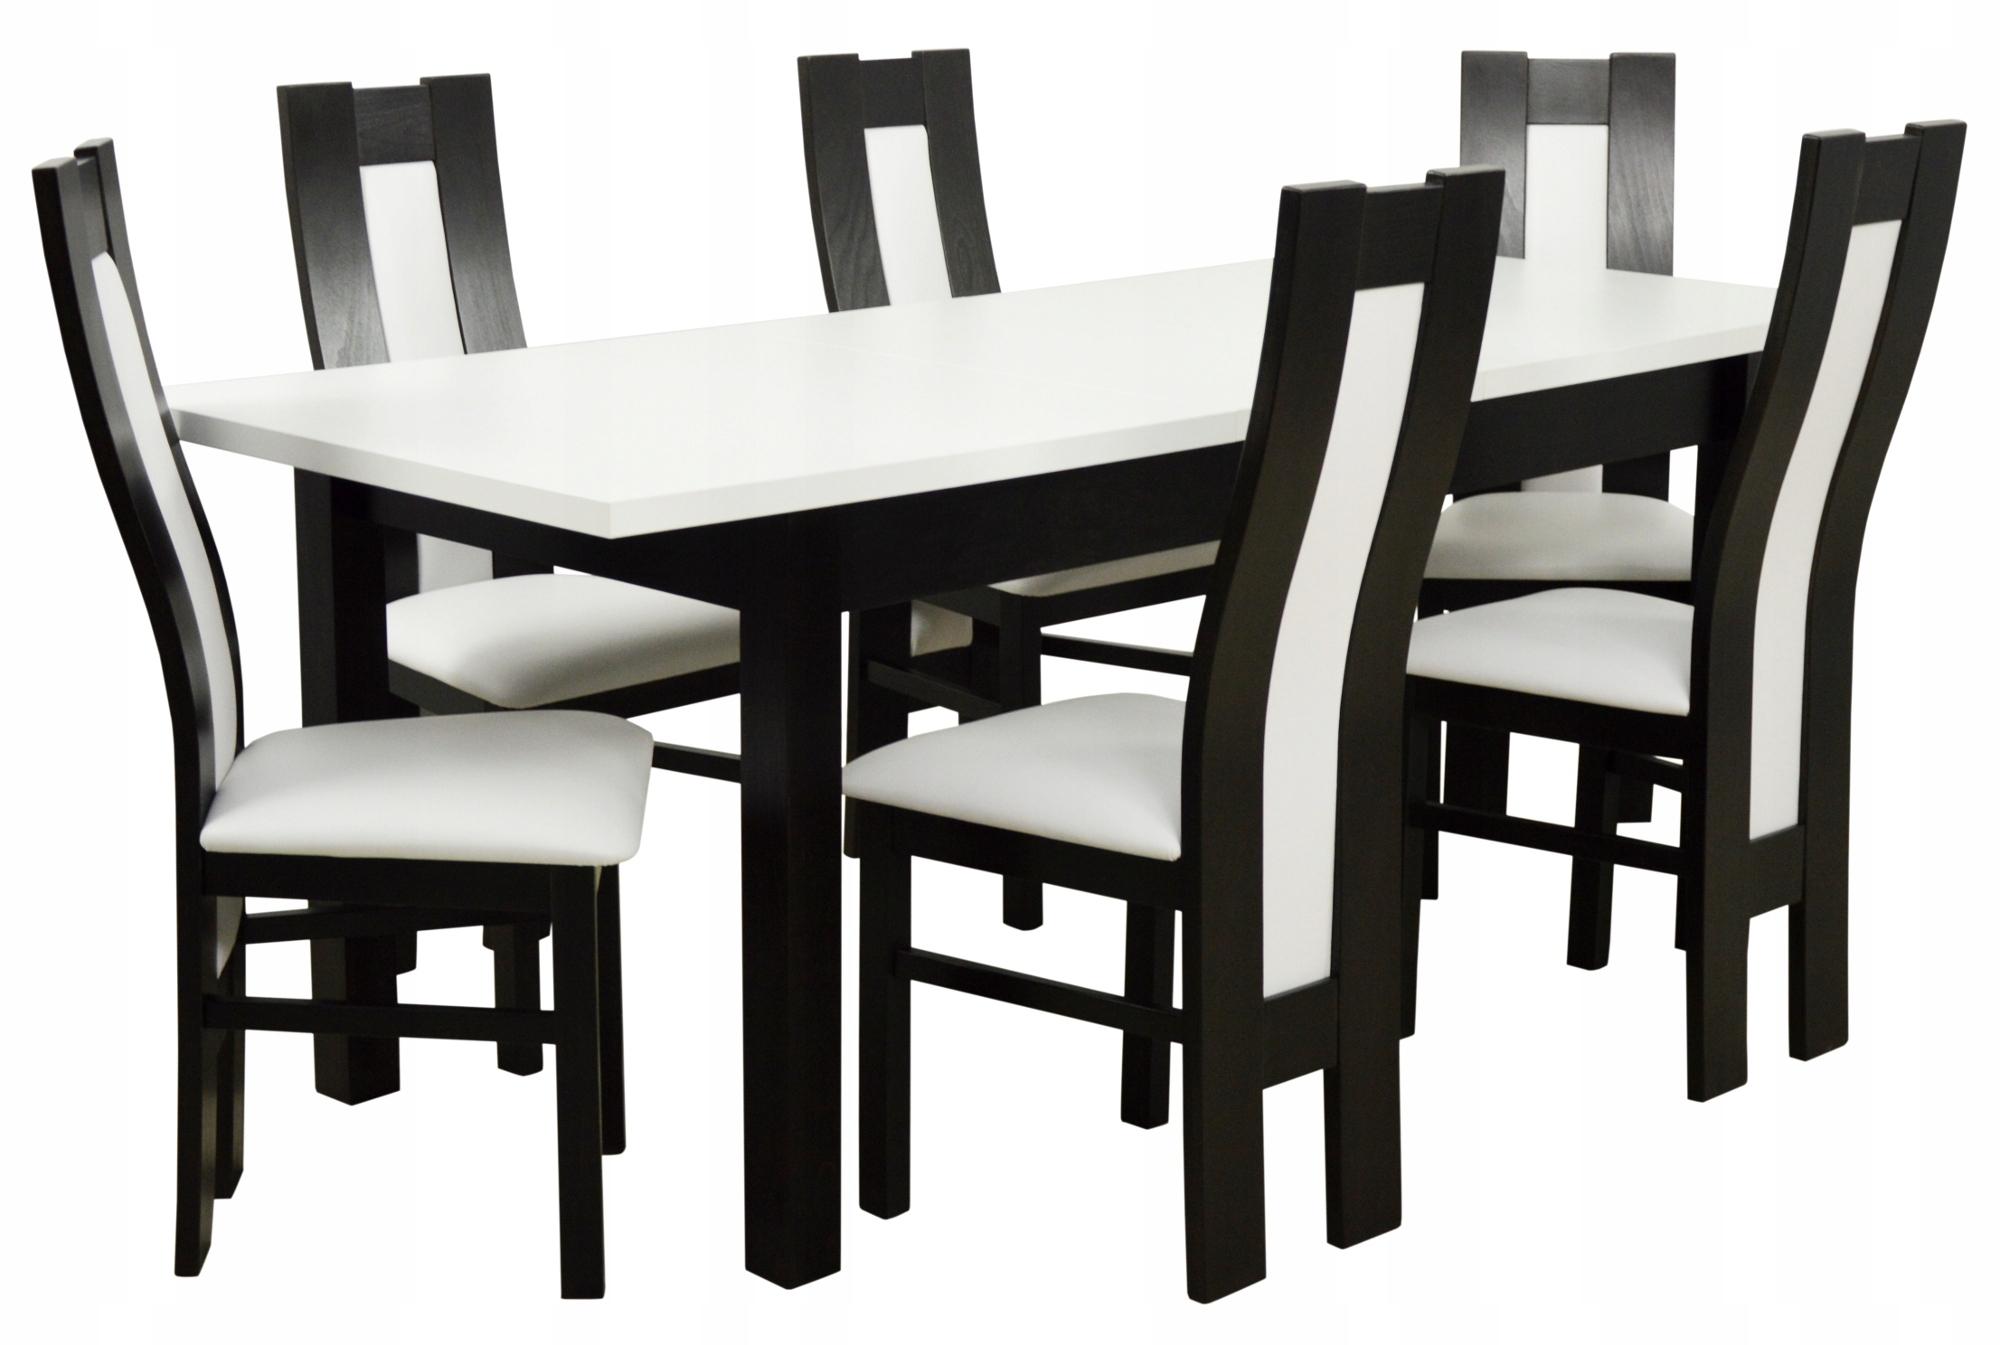 84f192e5b76c Kuchynský stôl + 6 stoličiek Wenge dosky biele DREVO